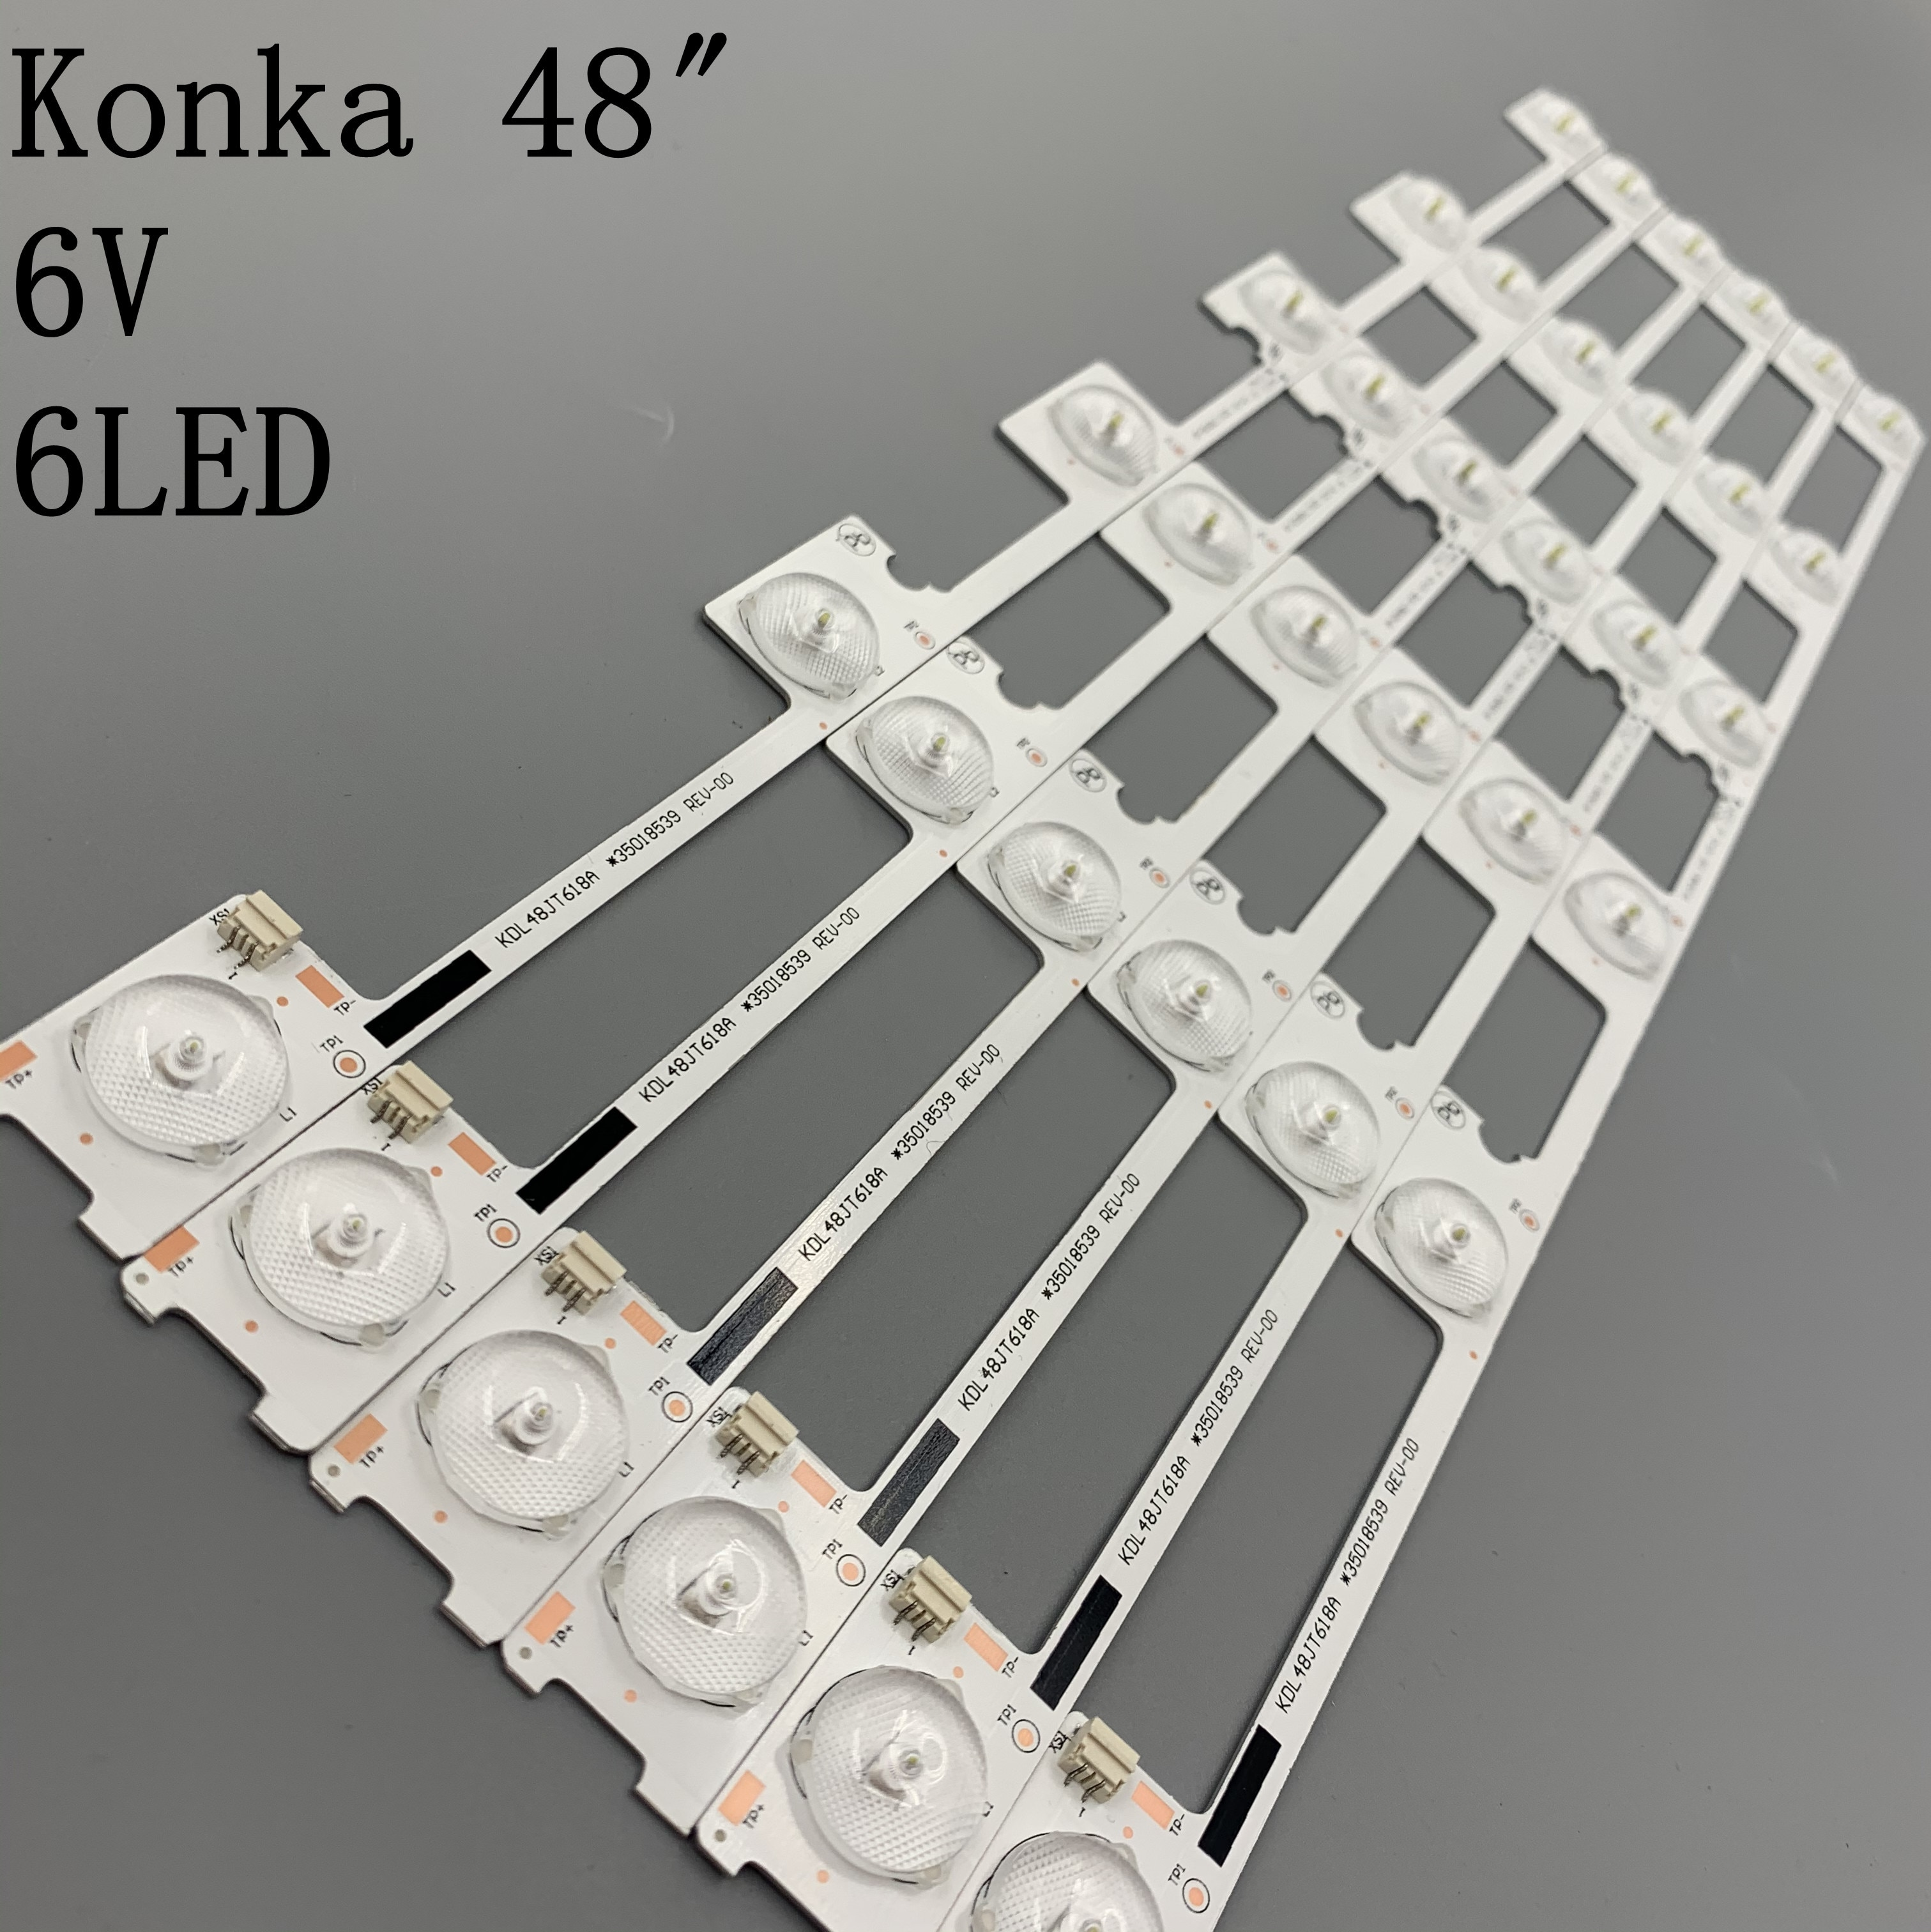 30PCS/Lot 100% Neue LED Streifen Bar Hintergrundbeleuchtung für KONKA KDL48JT618A KDL48SS618U 35018539 35018540 6 LED licht (6 V) 442mm